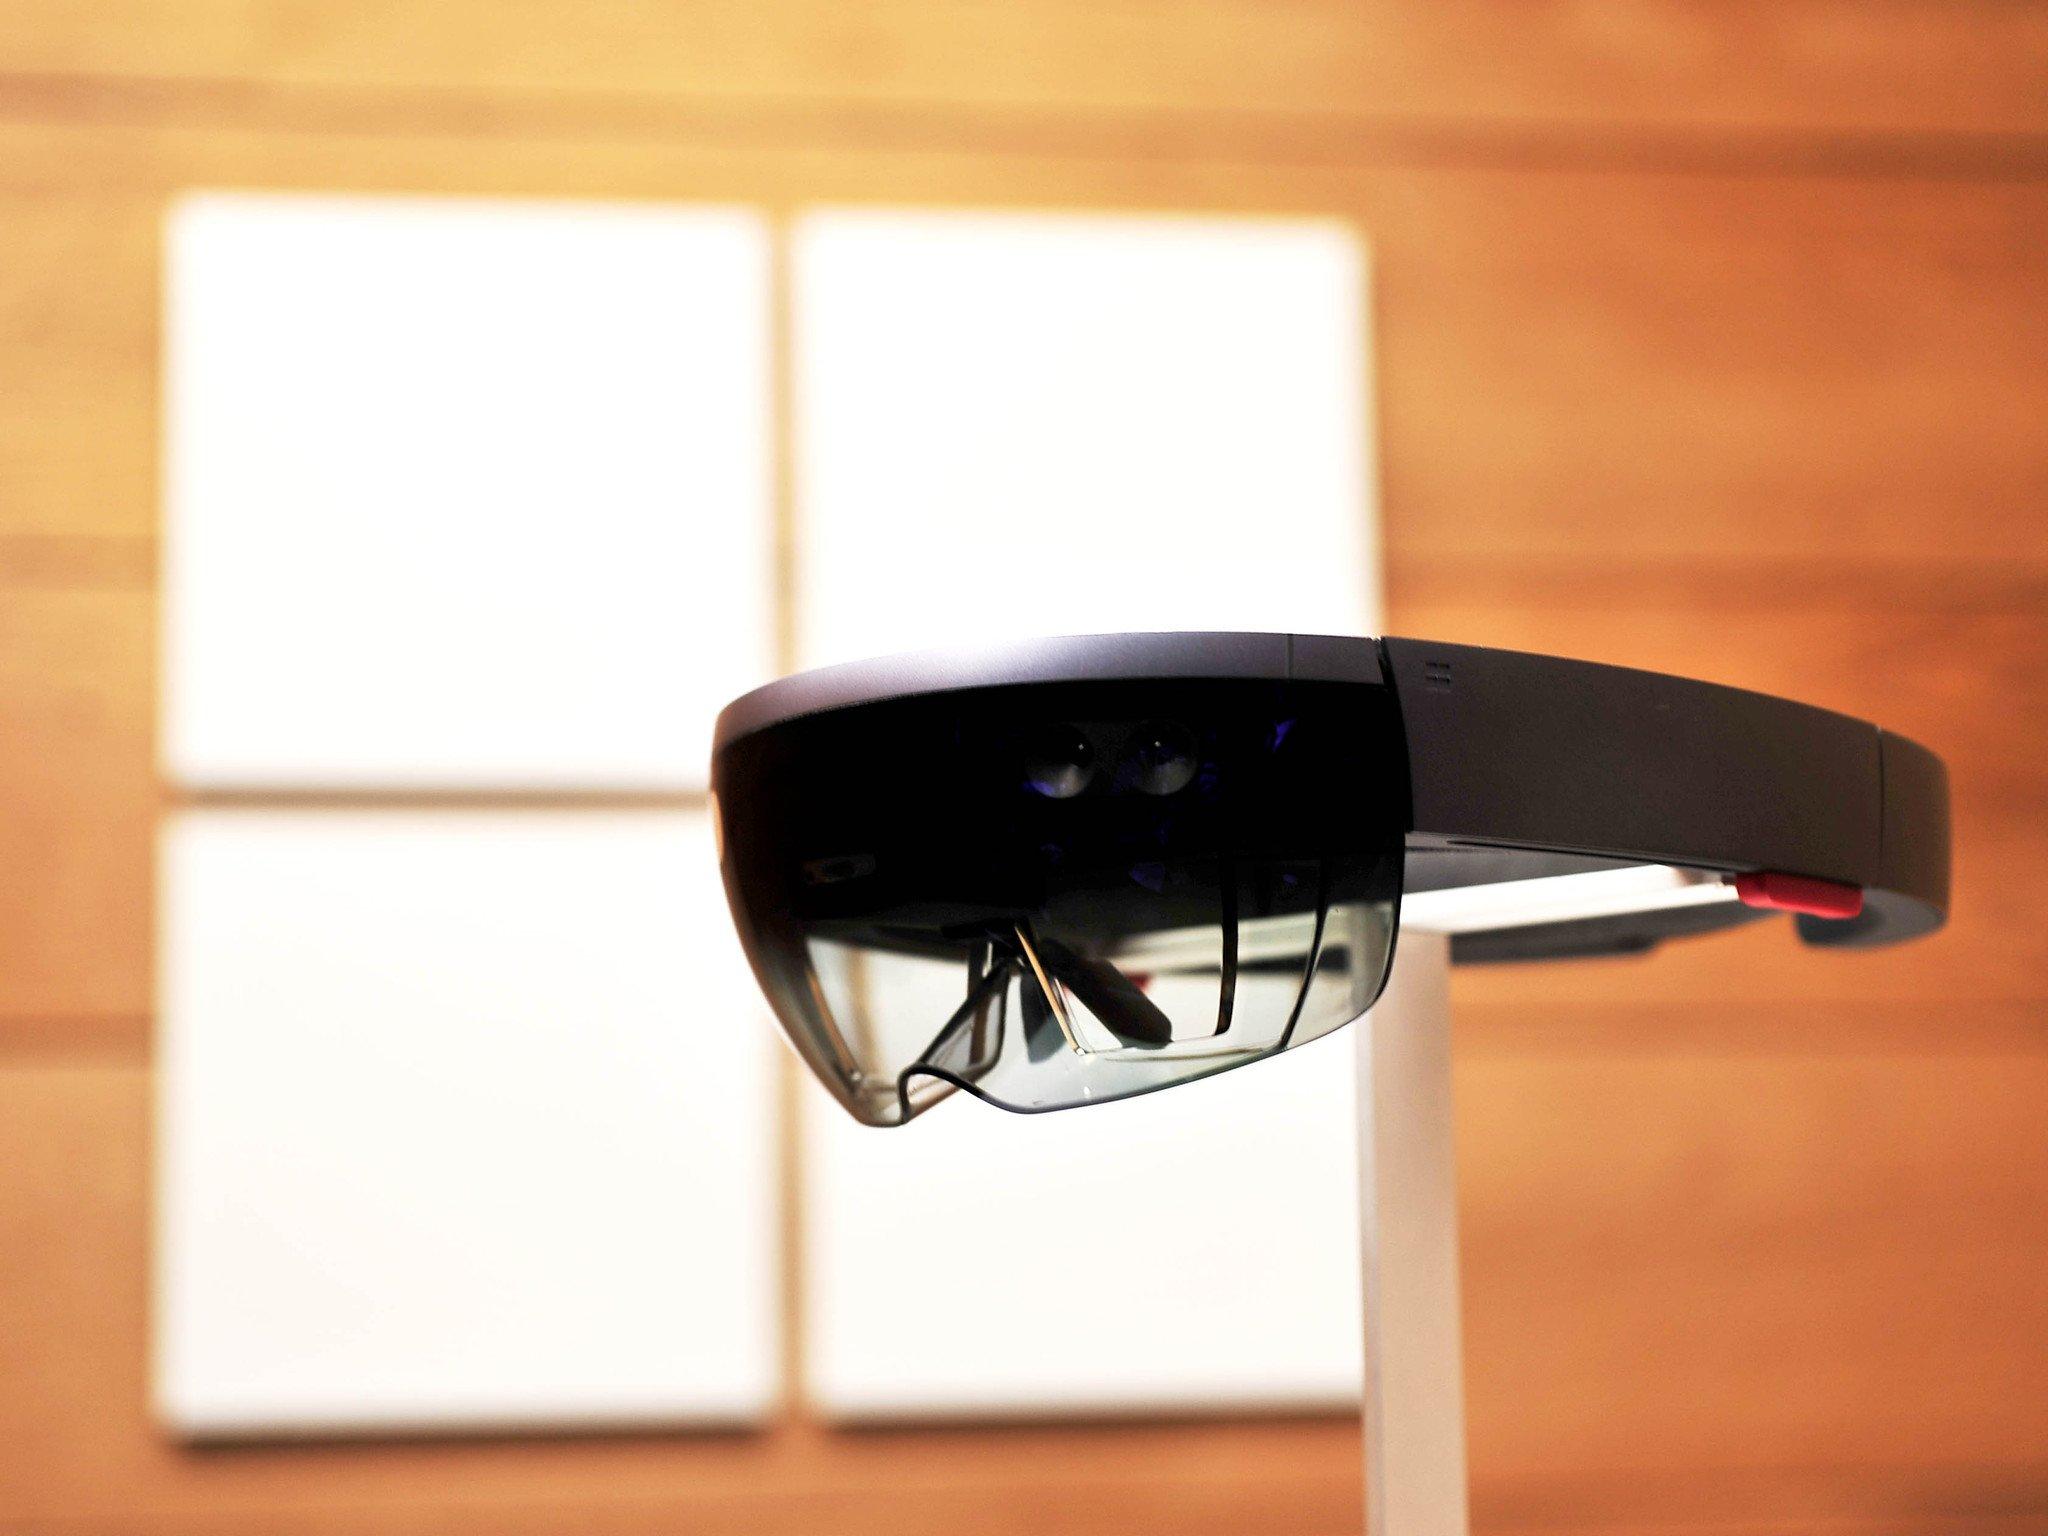 Microsoft' Ted Talk Hololens